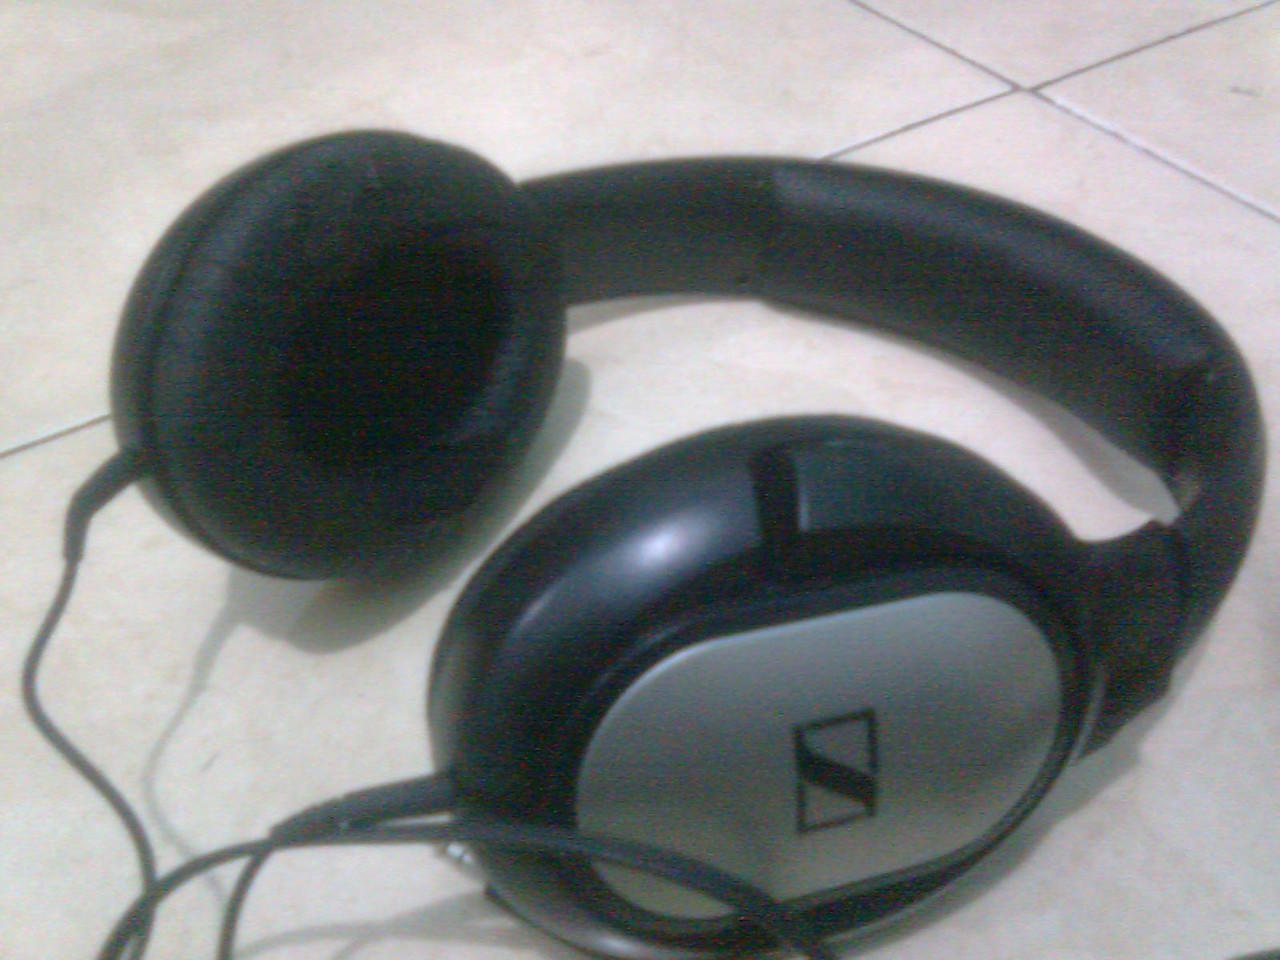 Sennheiser HD201 headphone bandung murah